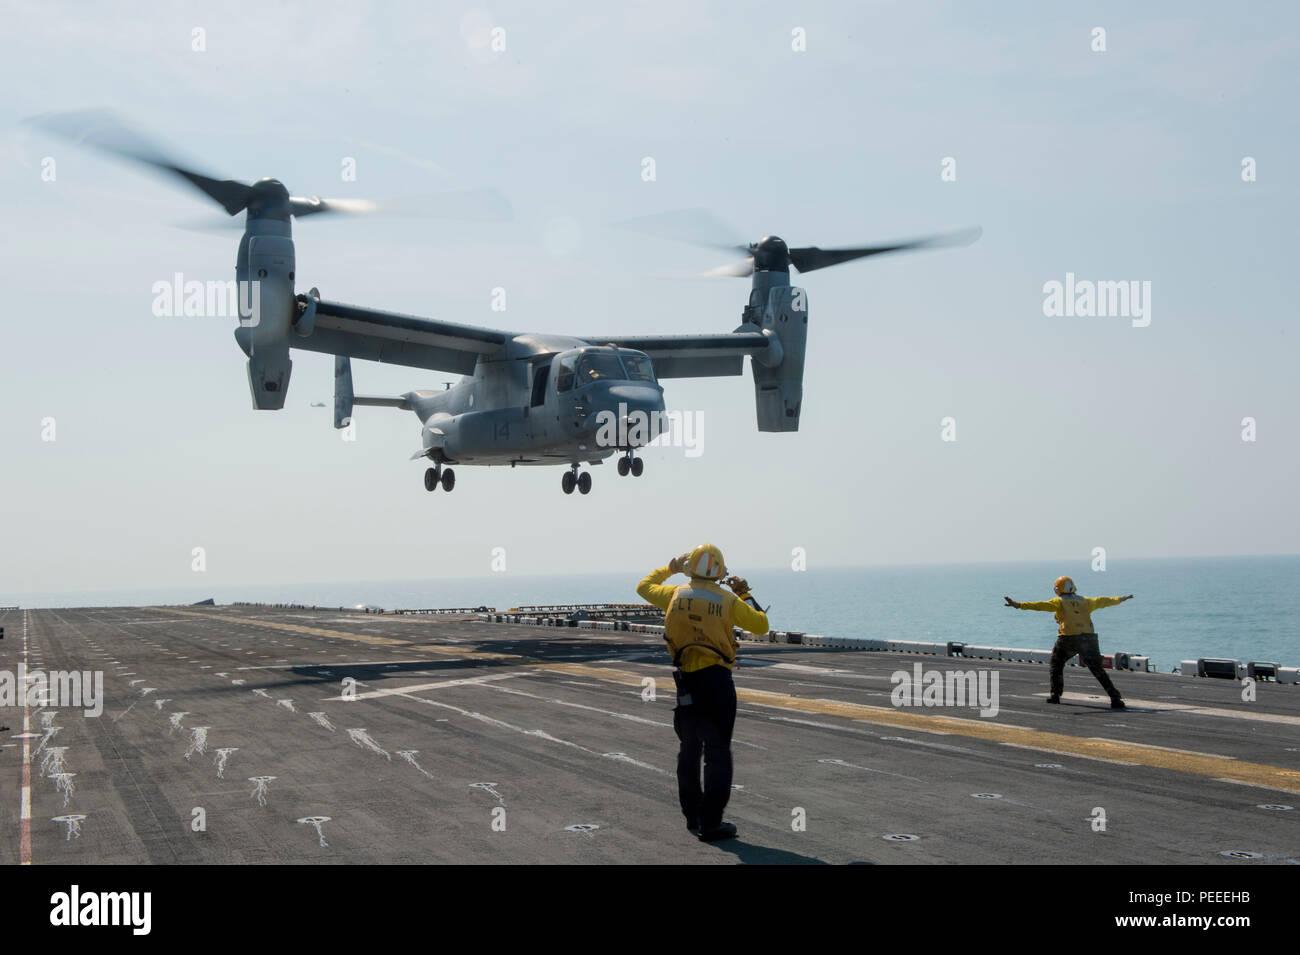 U S Navy Aviation Boatswains Mate Stock Photos Osprey Engine Diagram 150805 N Ax638 201 Atlantic Ocean Aug 5 2015